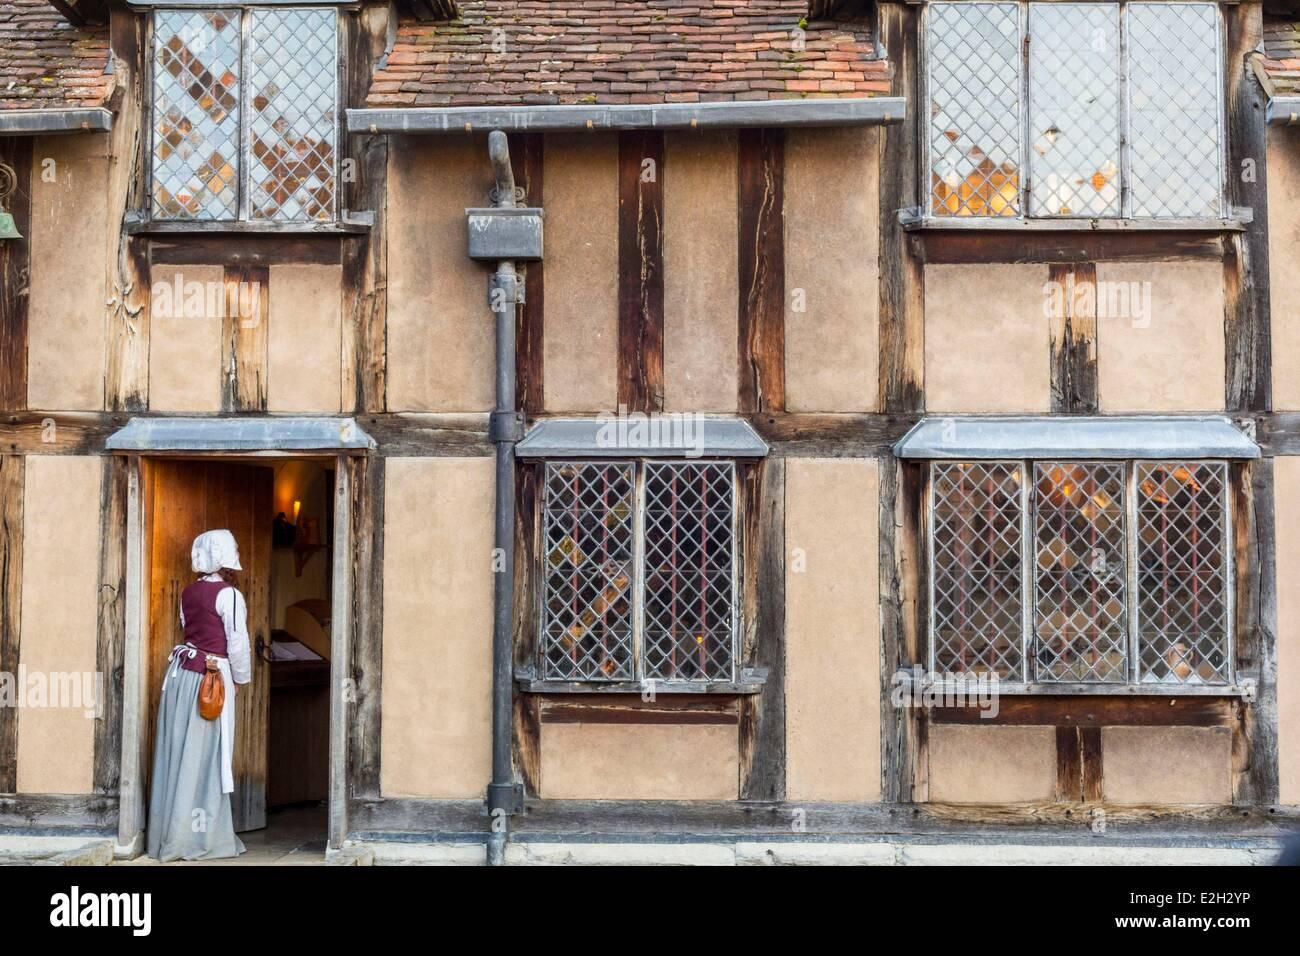 United Kingdom Warwickshire Stratford-upon-Avon birthplace of William Shakespeare where dramatist spent first five - Stock Image